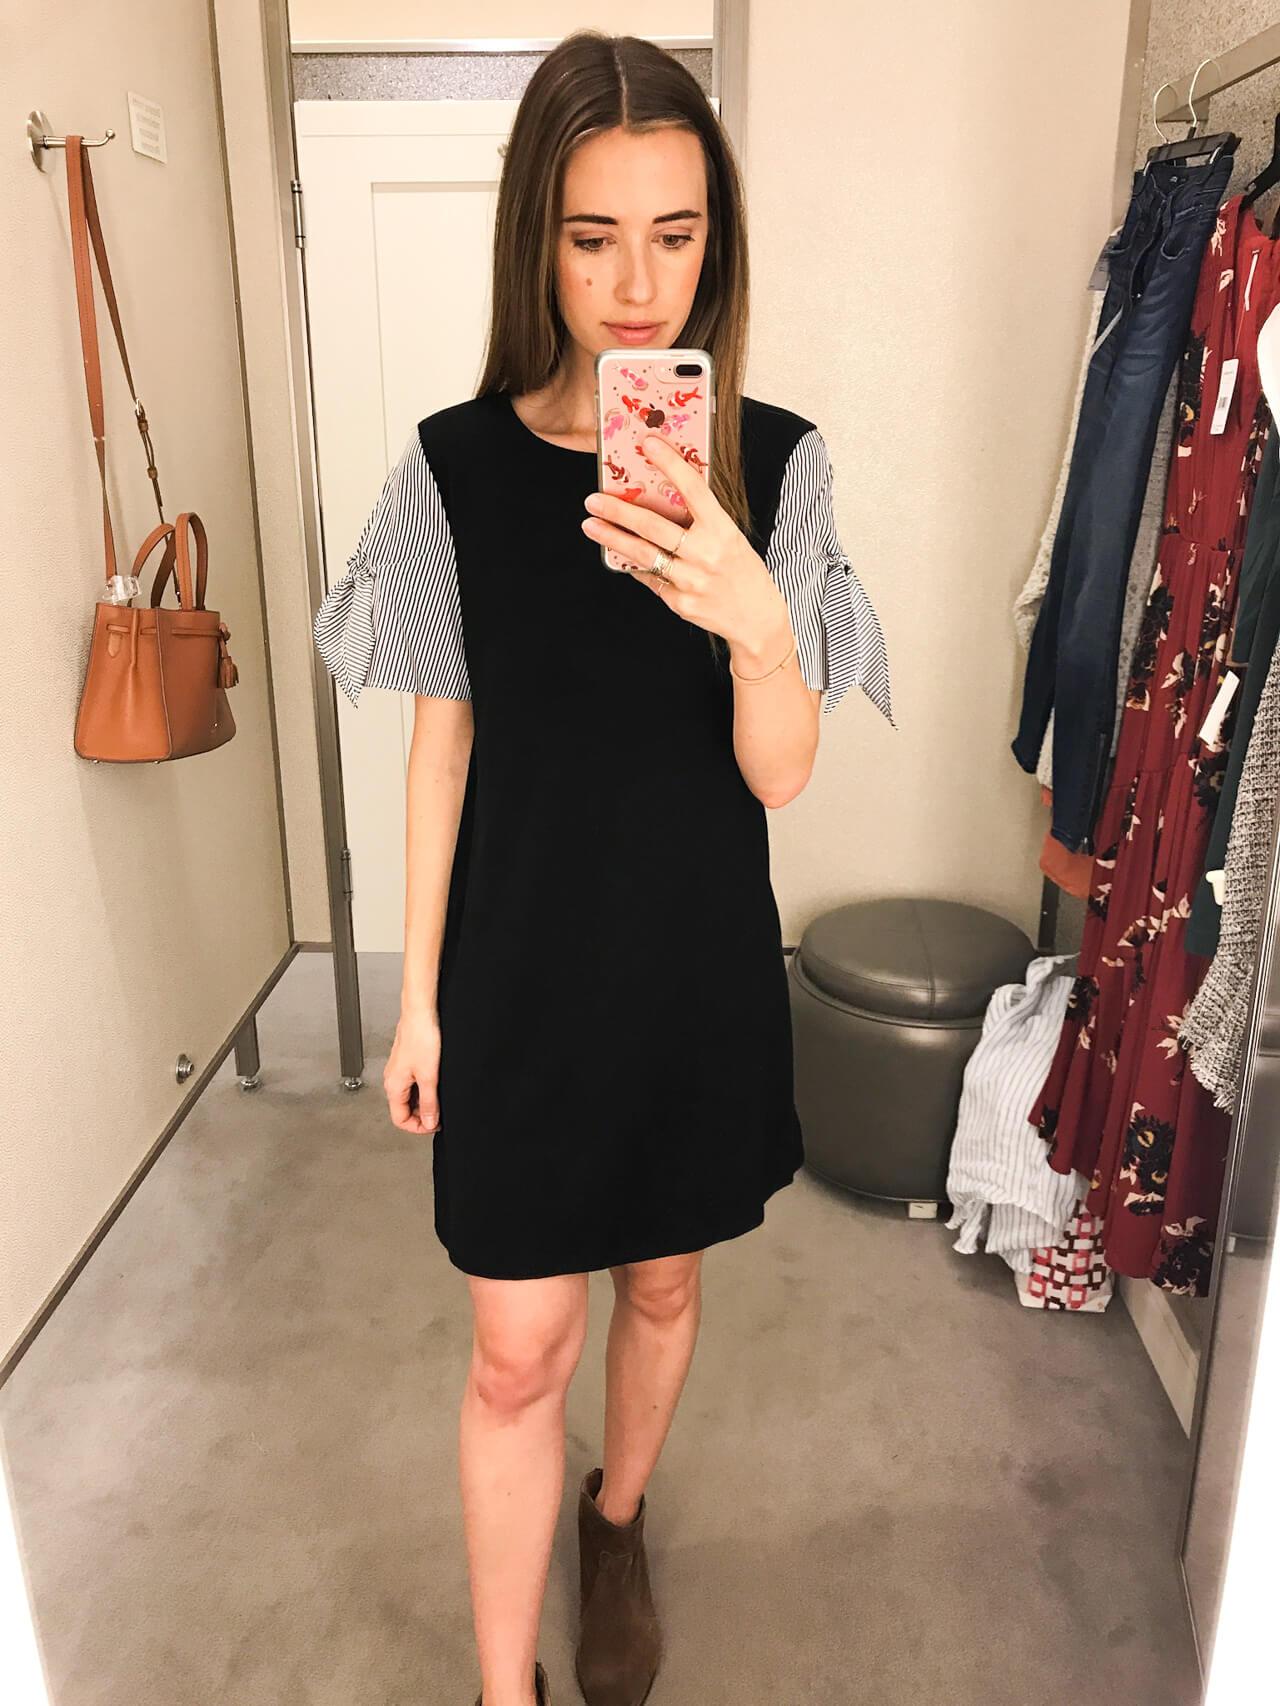 socialite_dress_ties